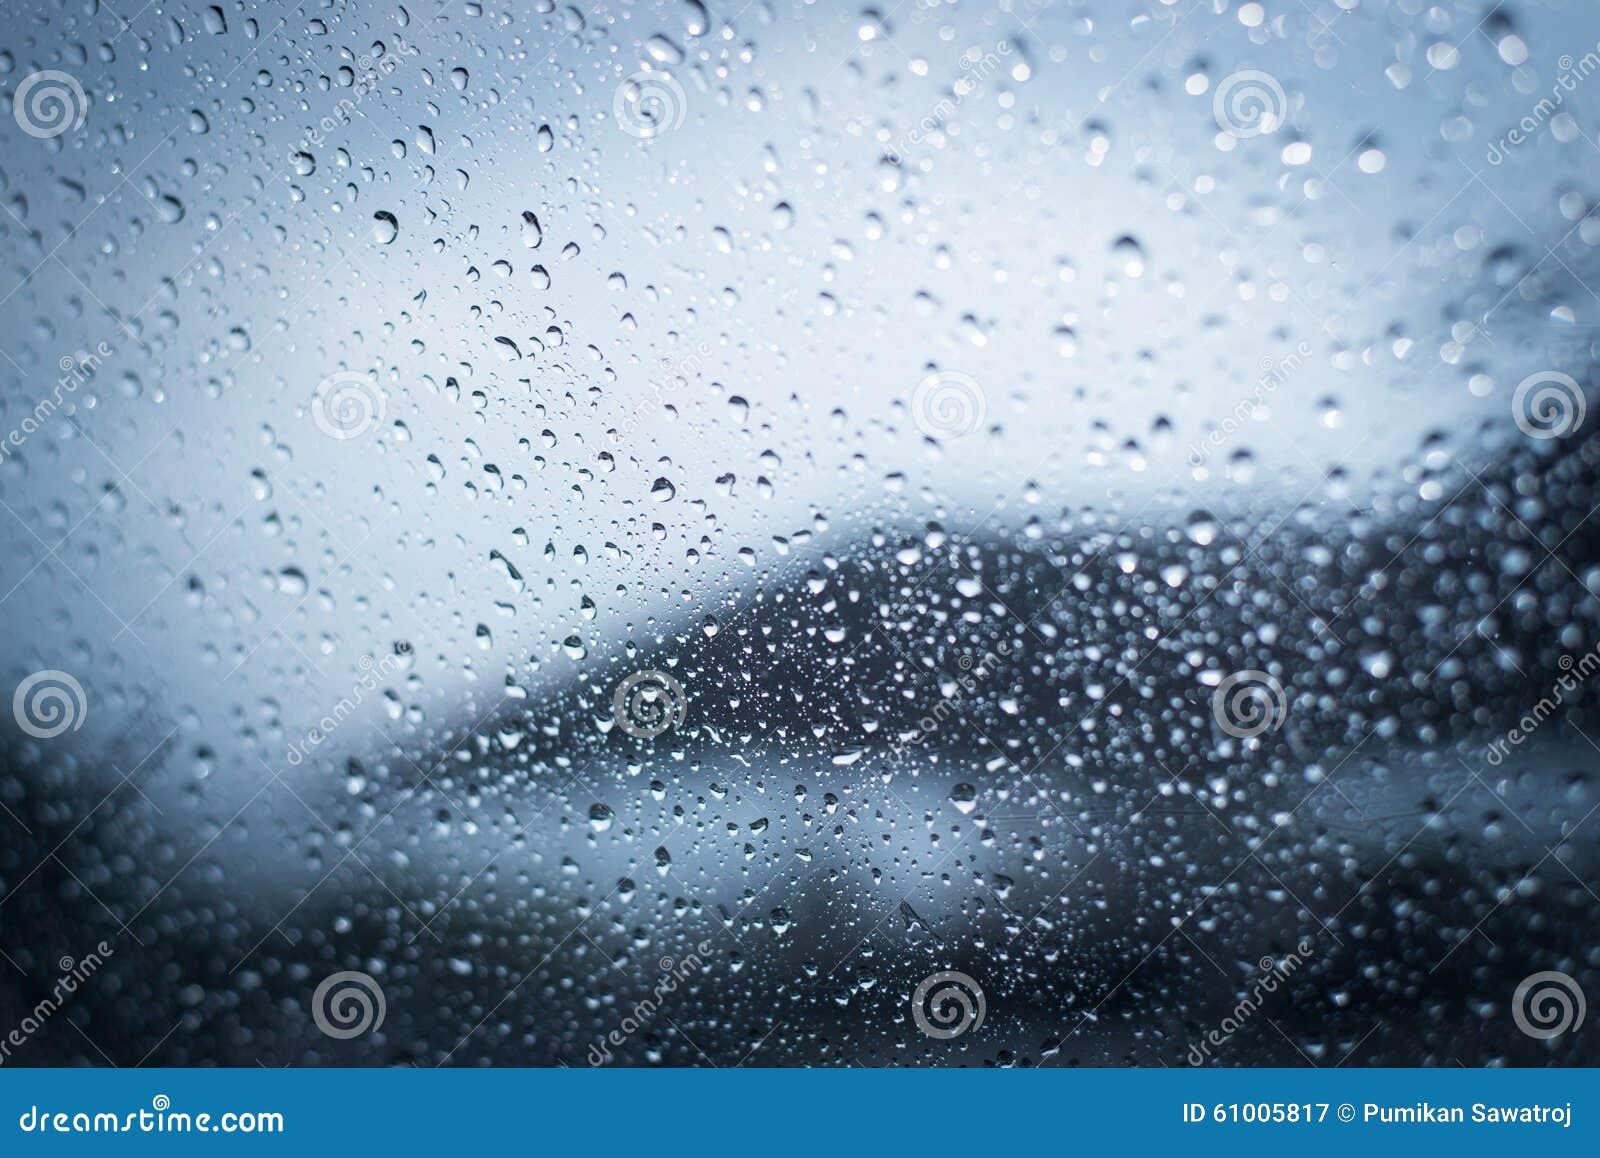 Os dias chuvosos, chuva deixam cair na janela, tempo chuvoso, fundo da chuva